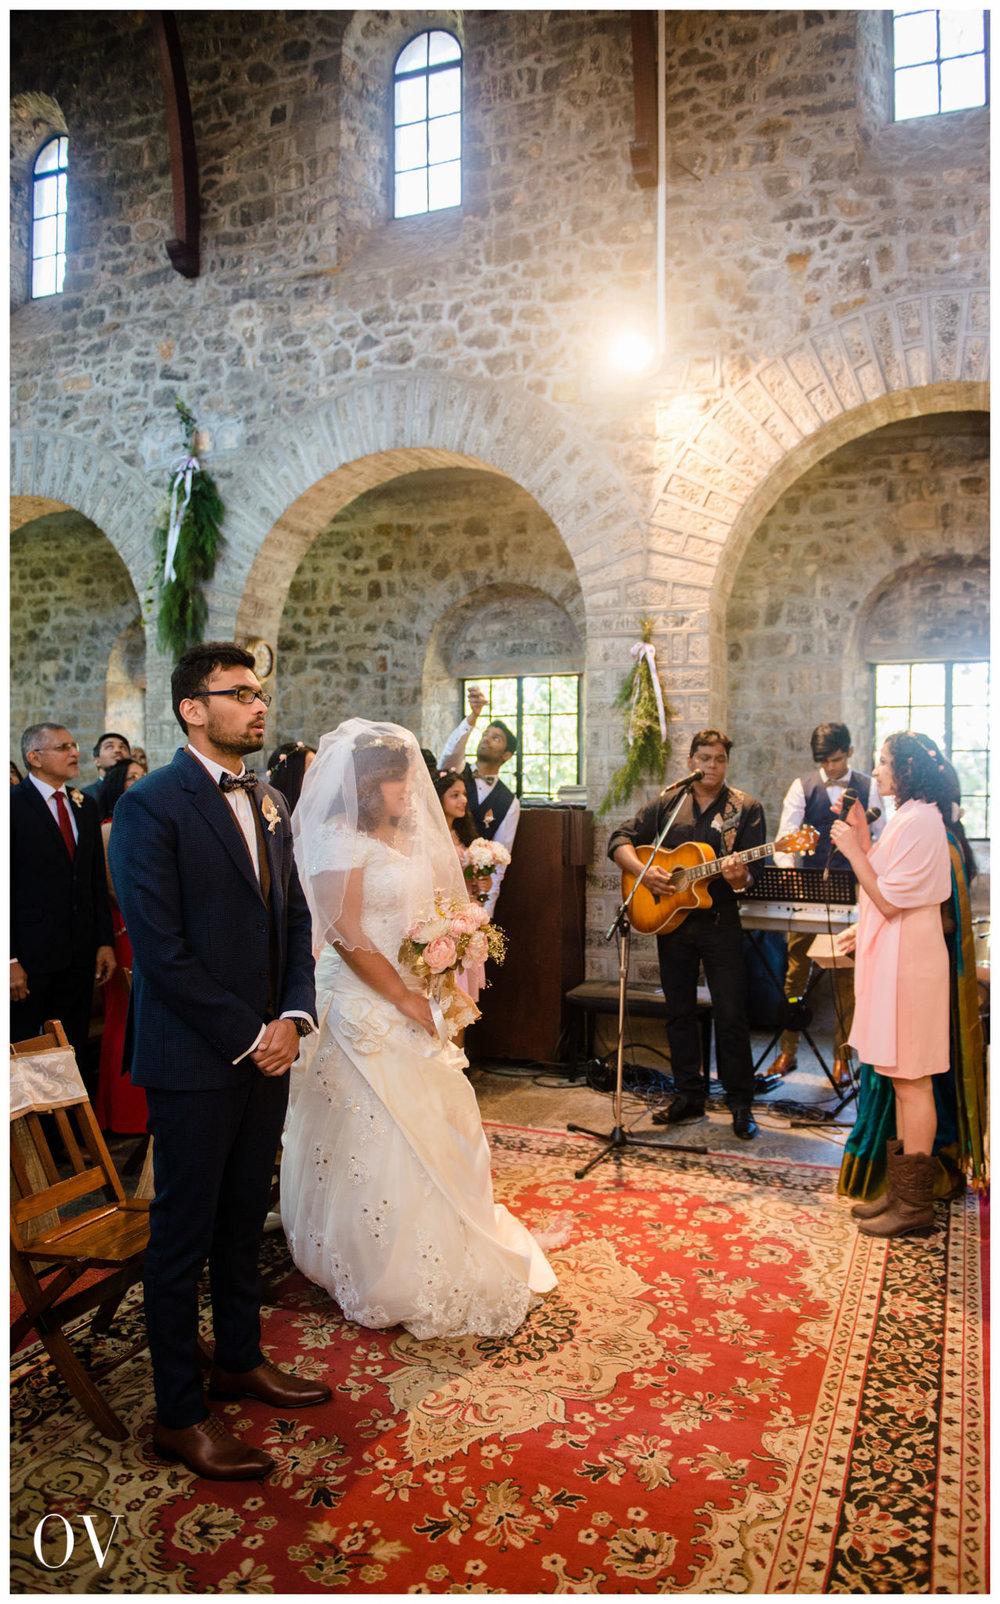 Israel Jordana-Kodaikanal Wedding-38.jpg